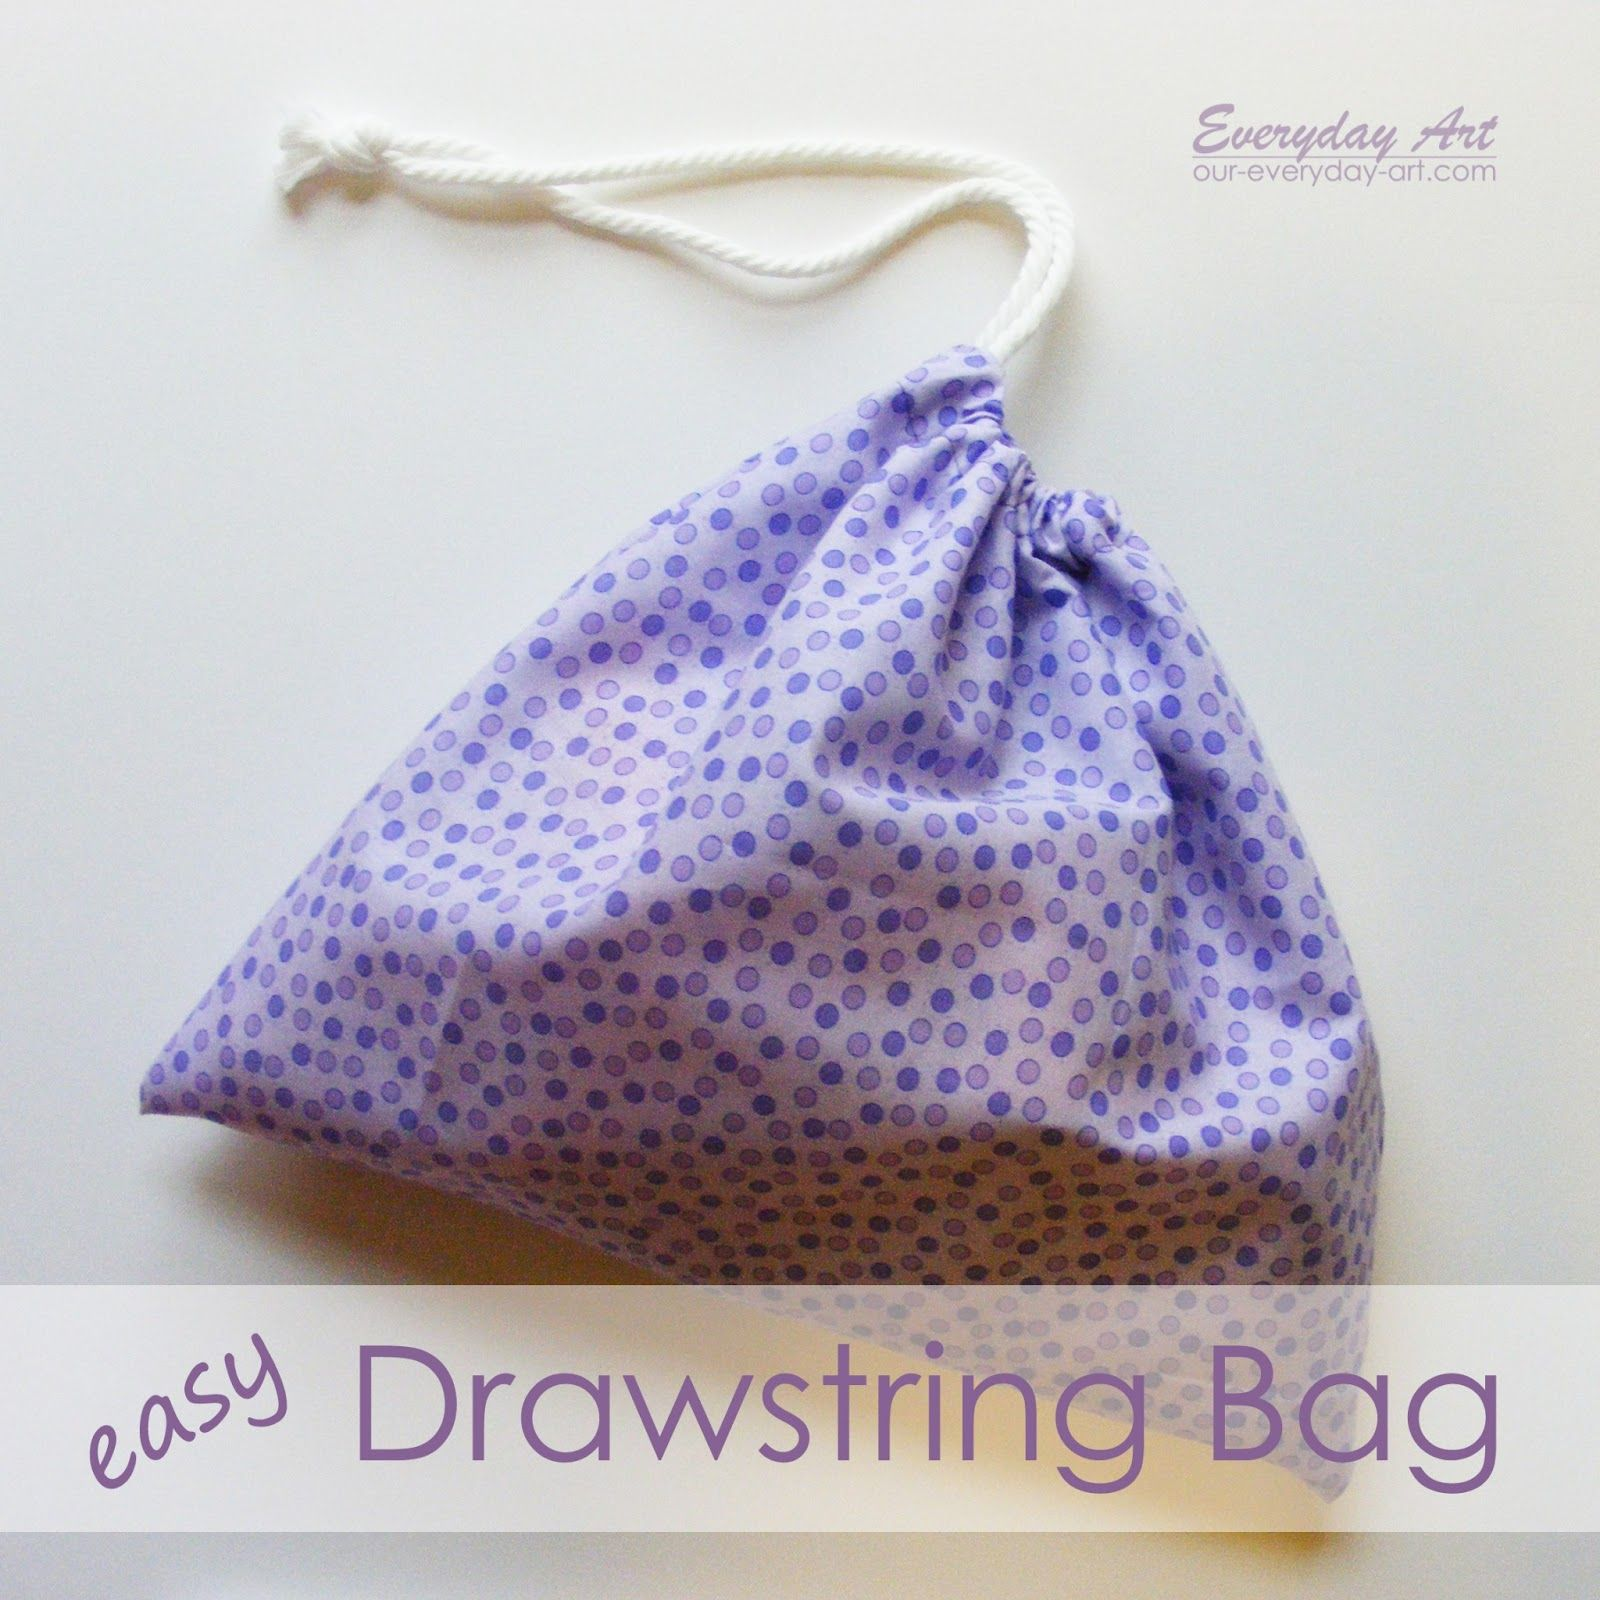 Everyday Art: Drawstring Bag